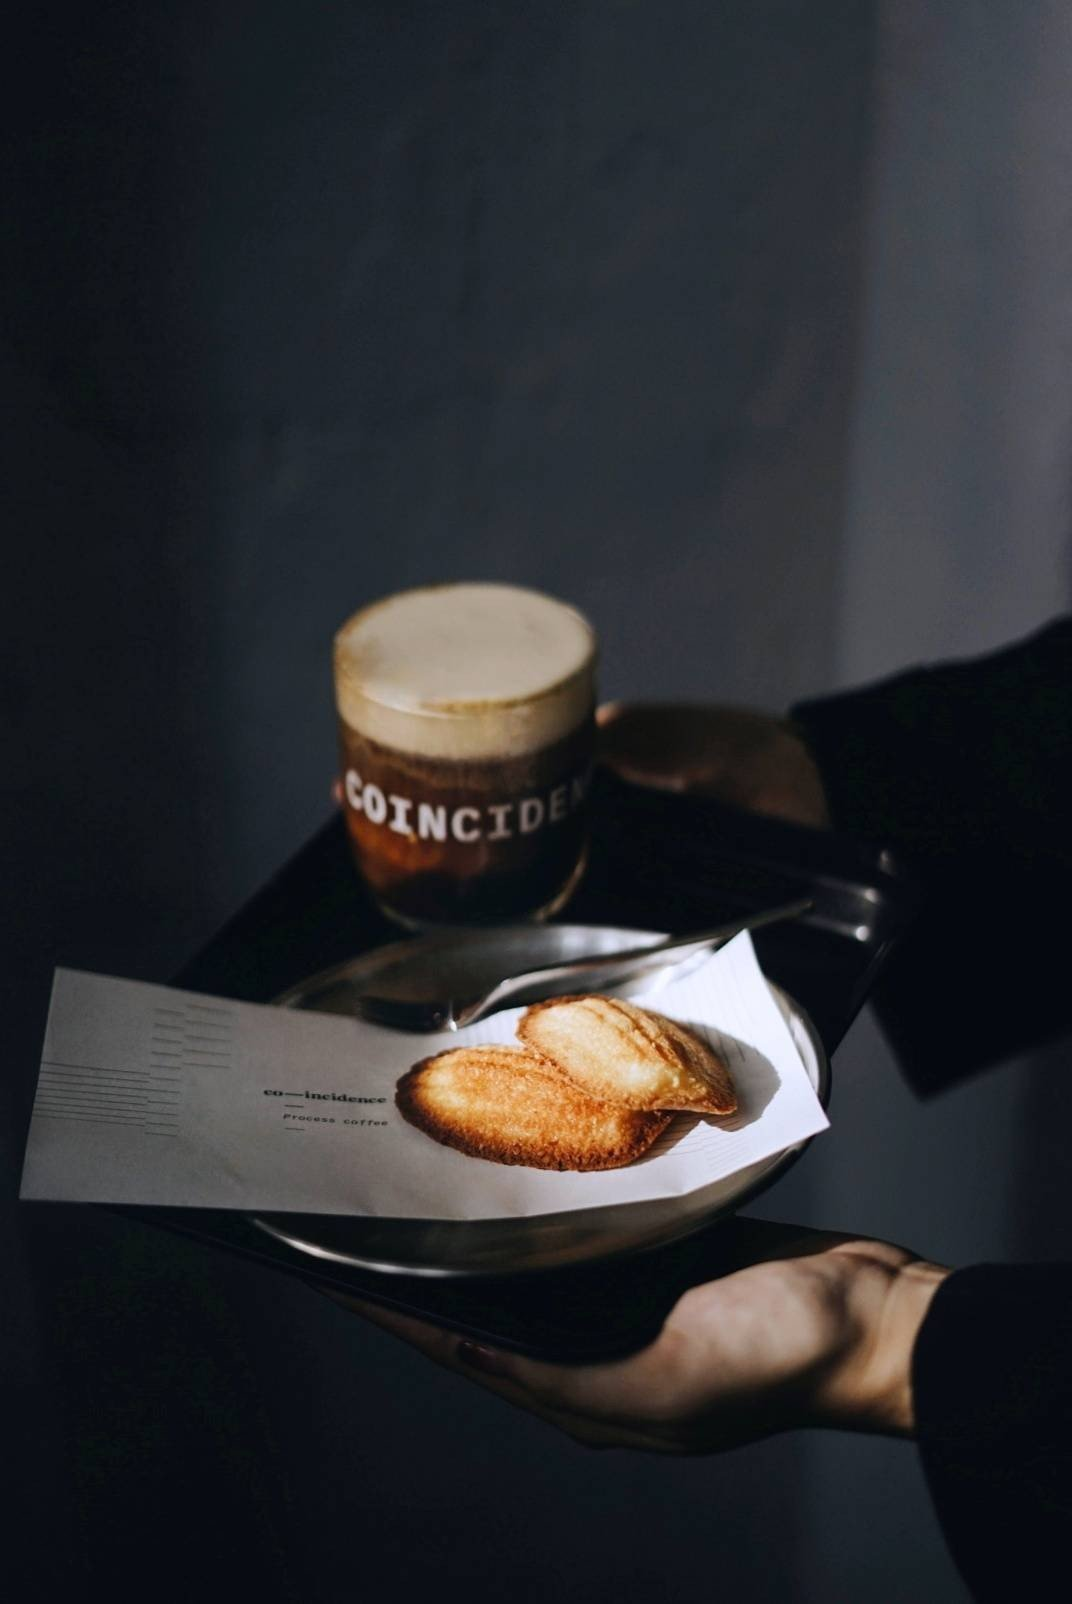 Co-incidence process coffee